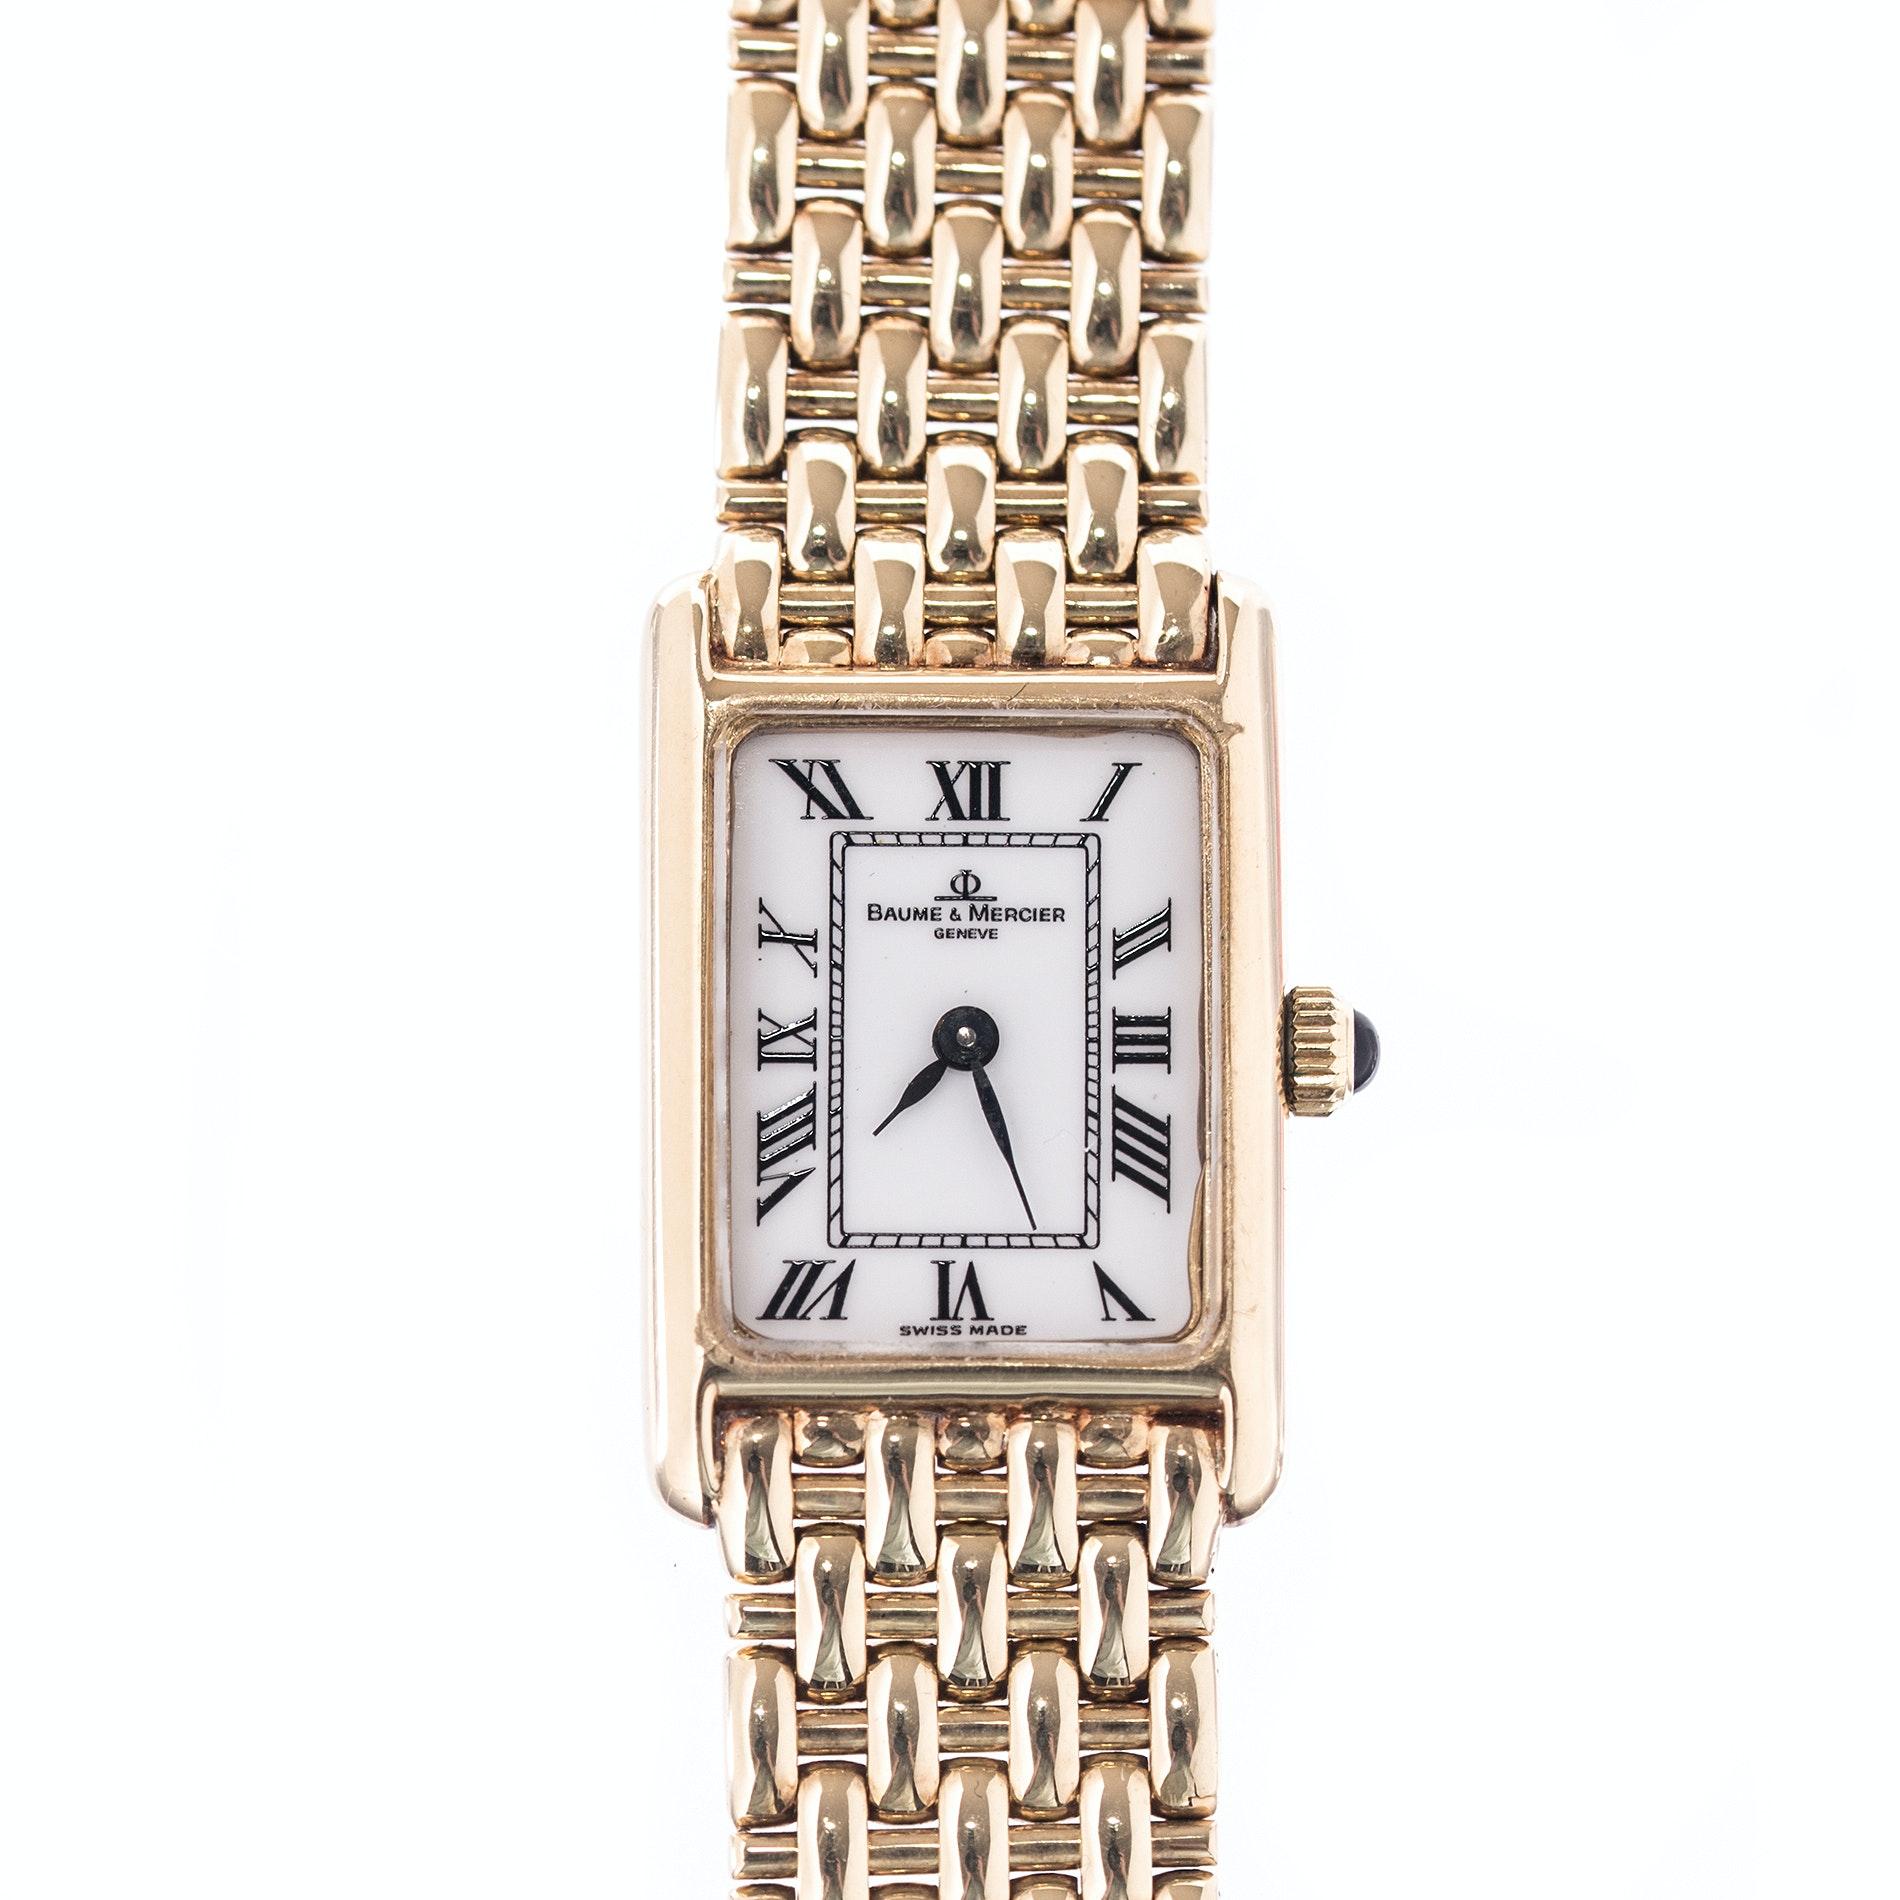 "Baume & Mercier ""Geneve"" 14K Yellow Gold Wristwatch"